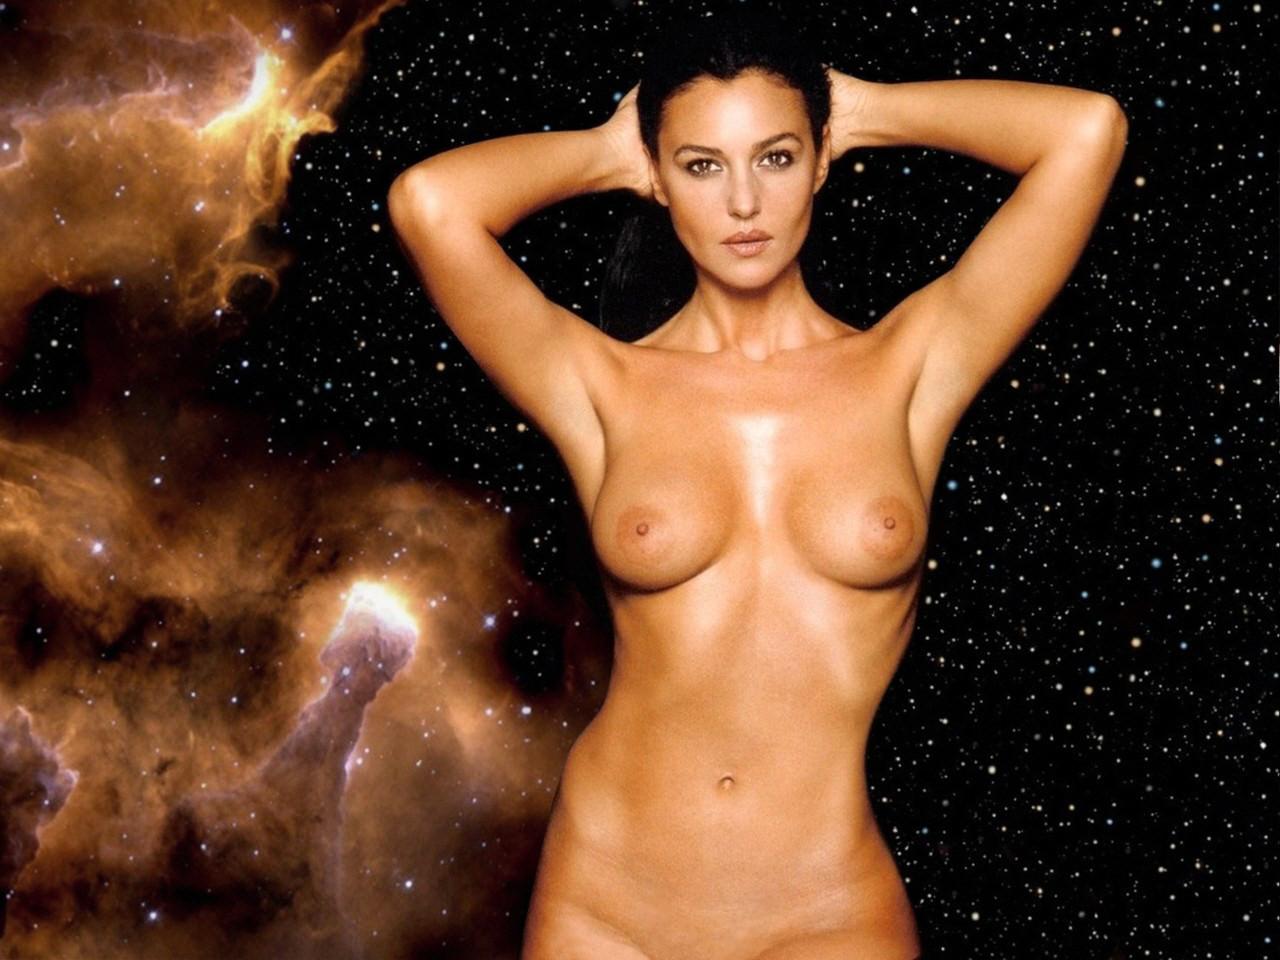 видео голых звезд голливуда - 7